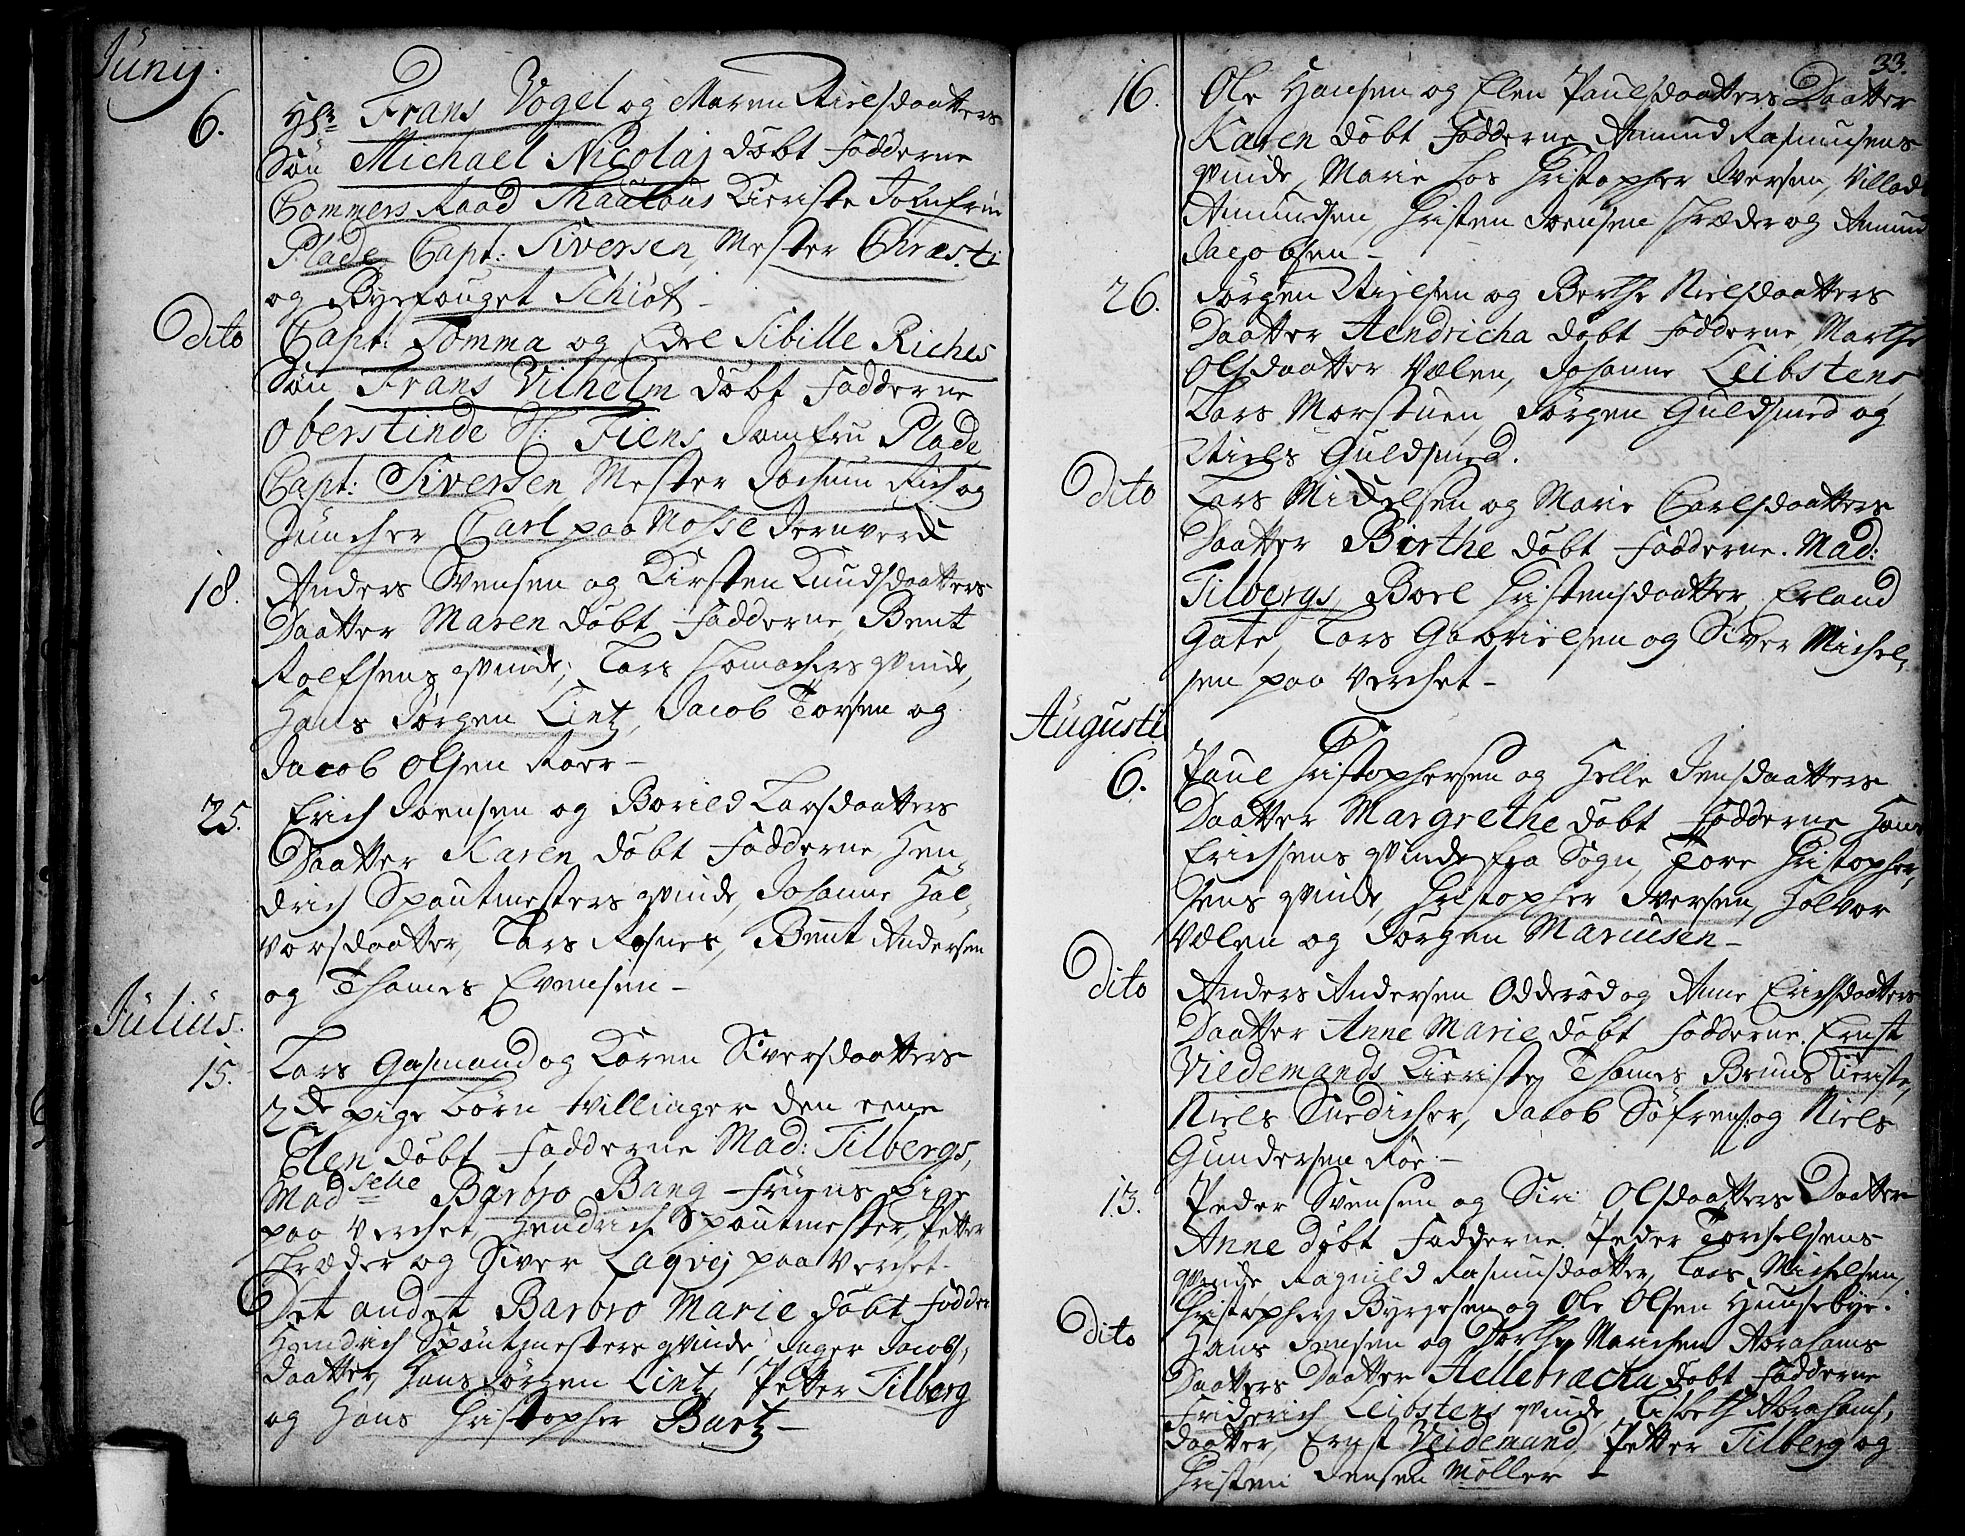 SAO, Moss prestekontor Kirkebøker, F/Fa/Faa/L0001: Ministerialbok nr. I 1, 1725-1752, s. 33